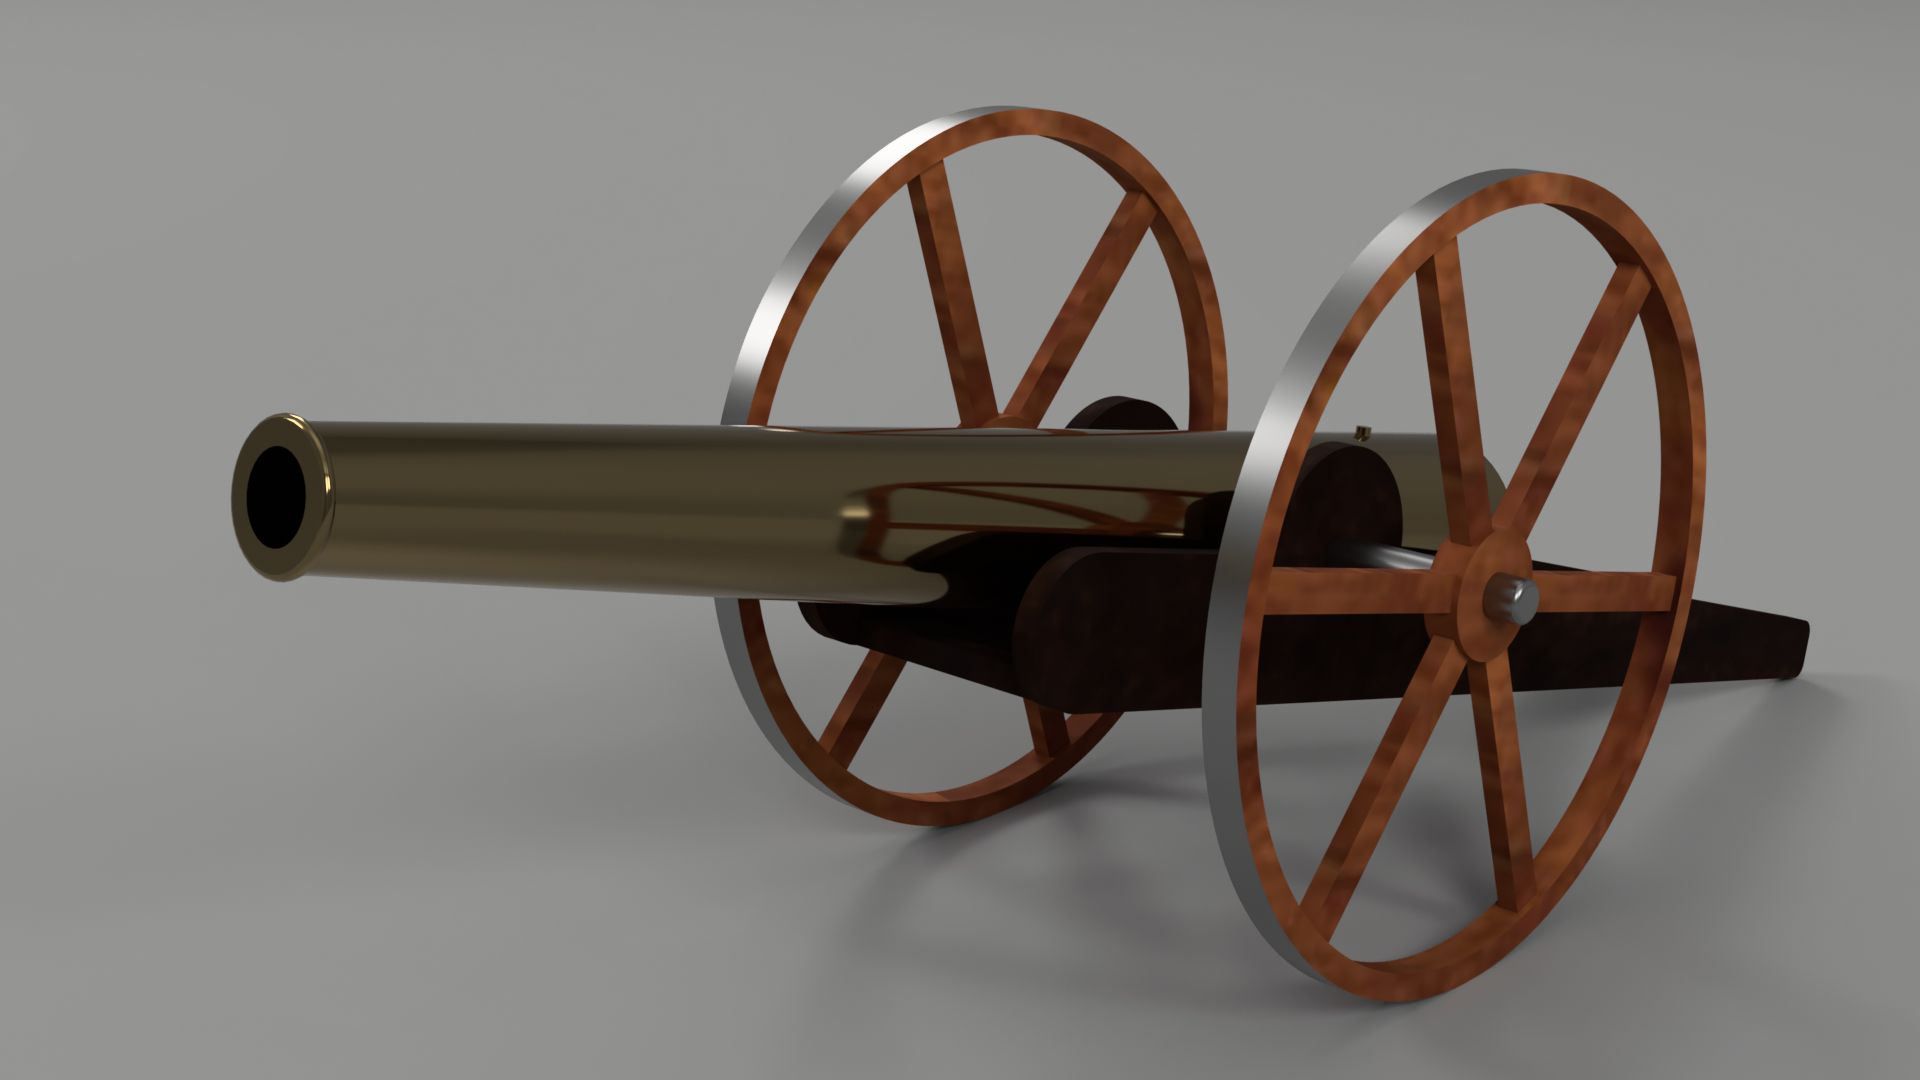 Cannon-2017-dec-05-11-37-30am-000-customizedview5824203635-png-3500-3500